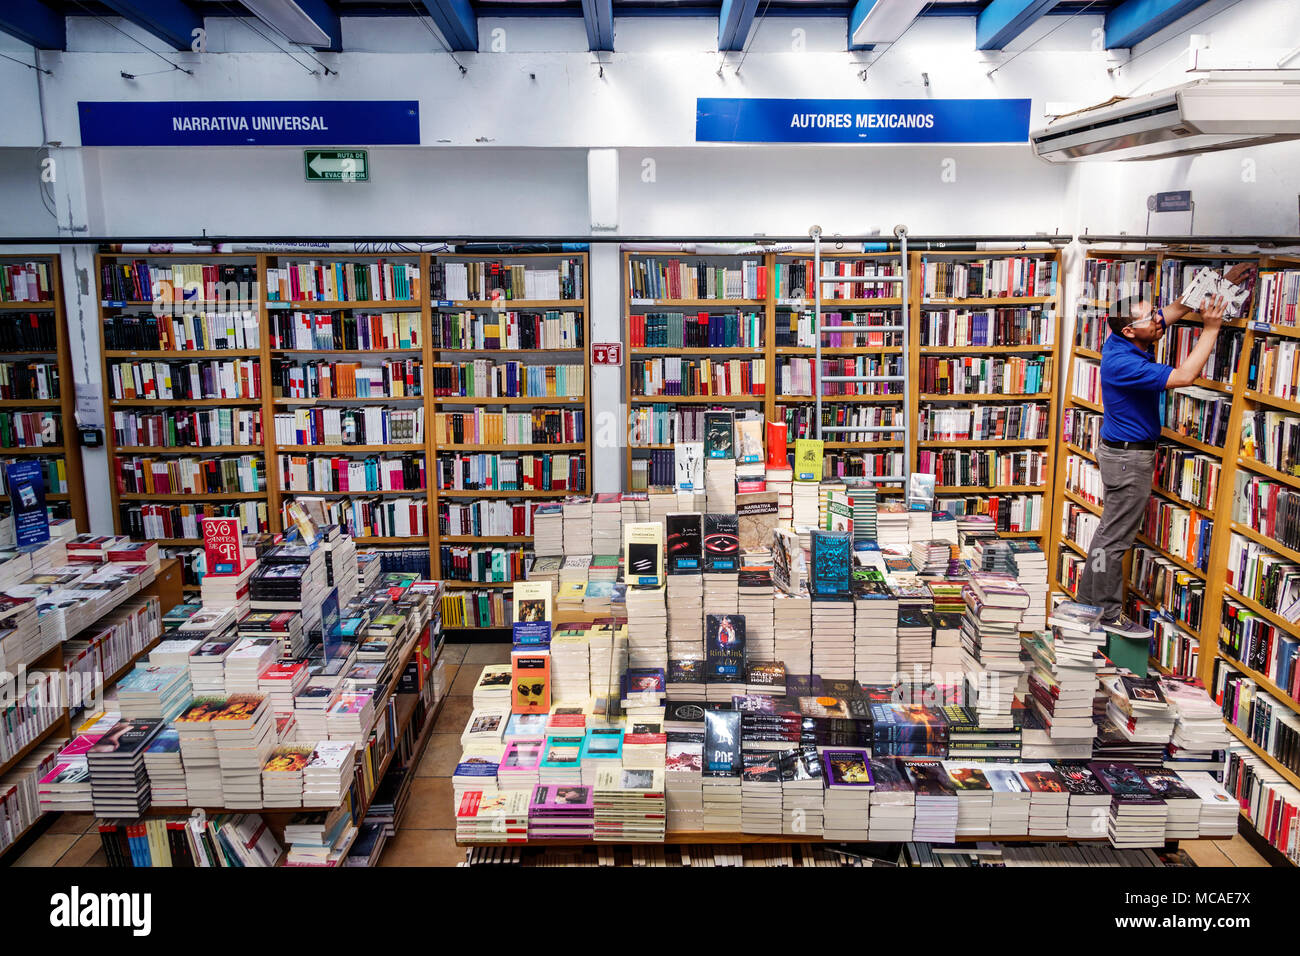 Books display stock photos books display stock images alamy - Libreria carmen ...